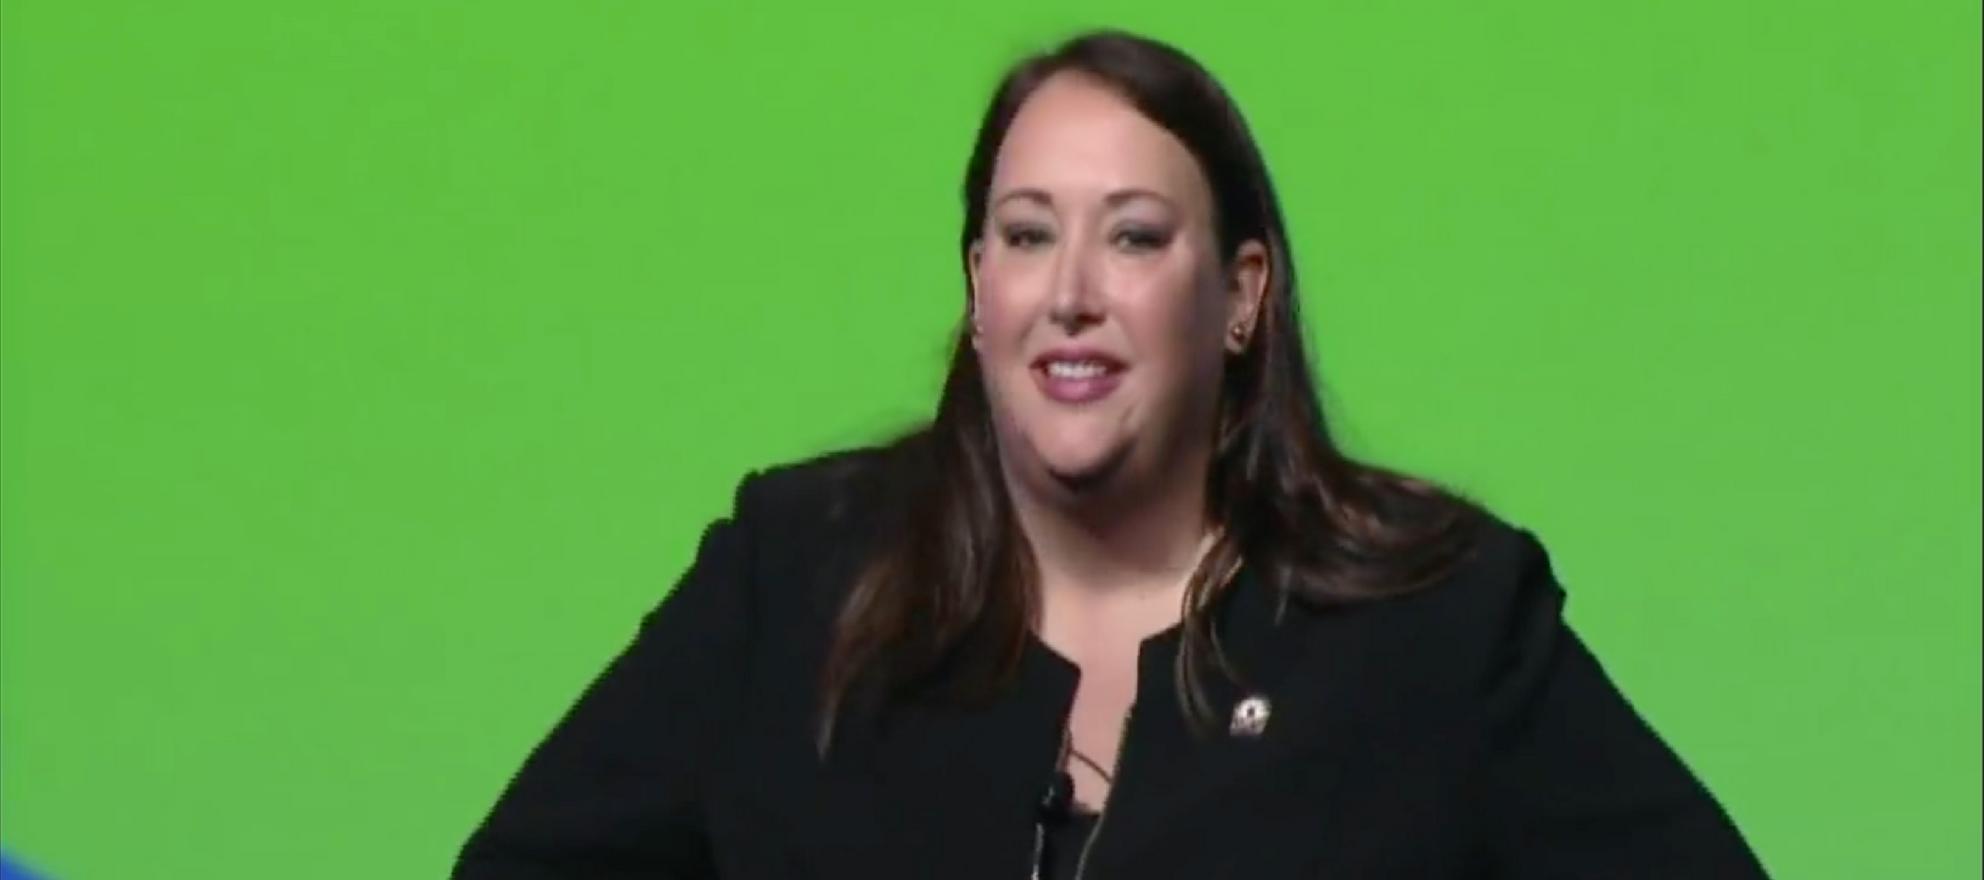 NAR president-elect Elizabeth Mendenhall